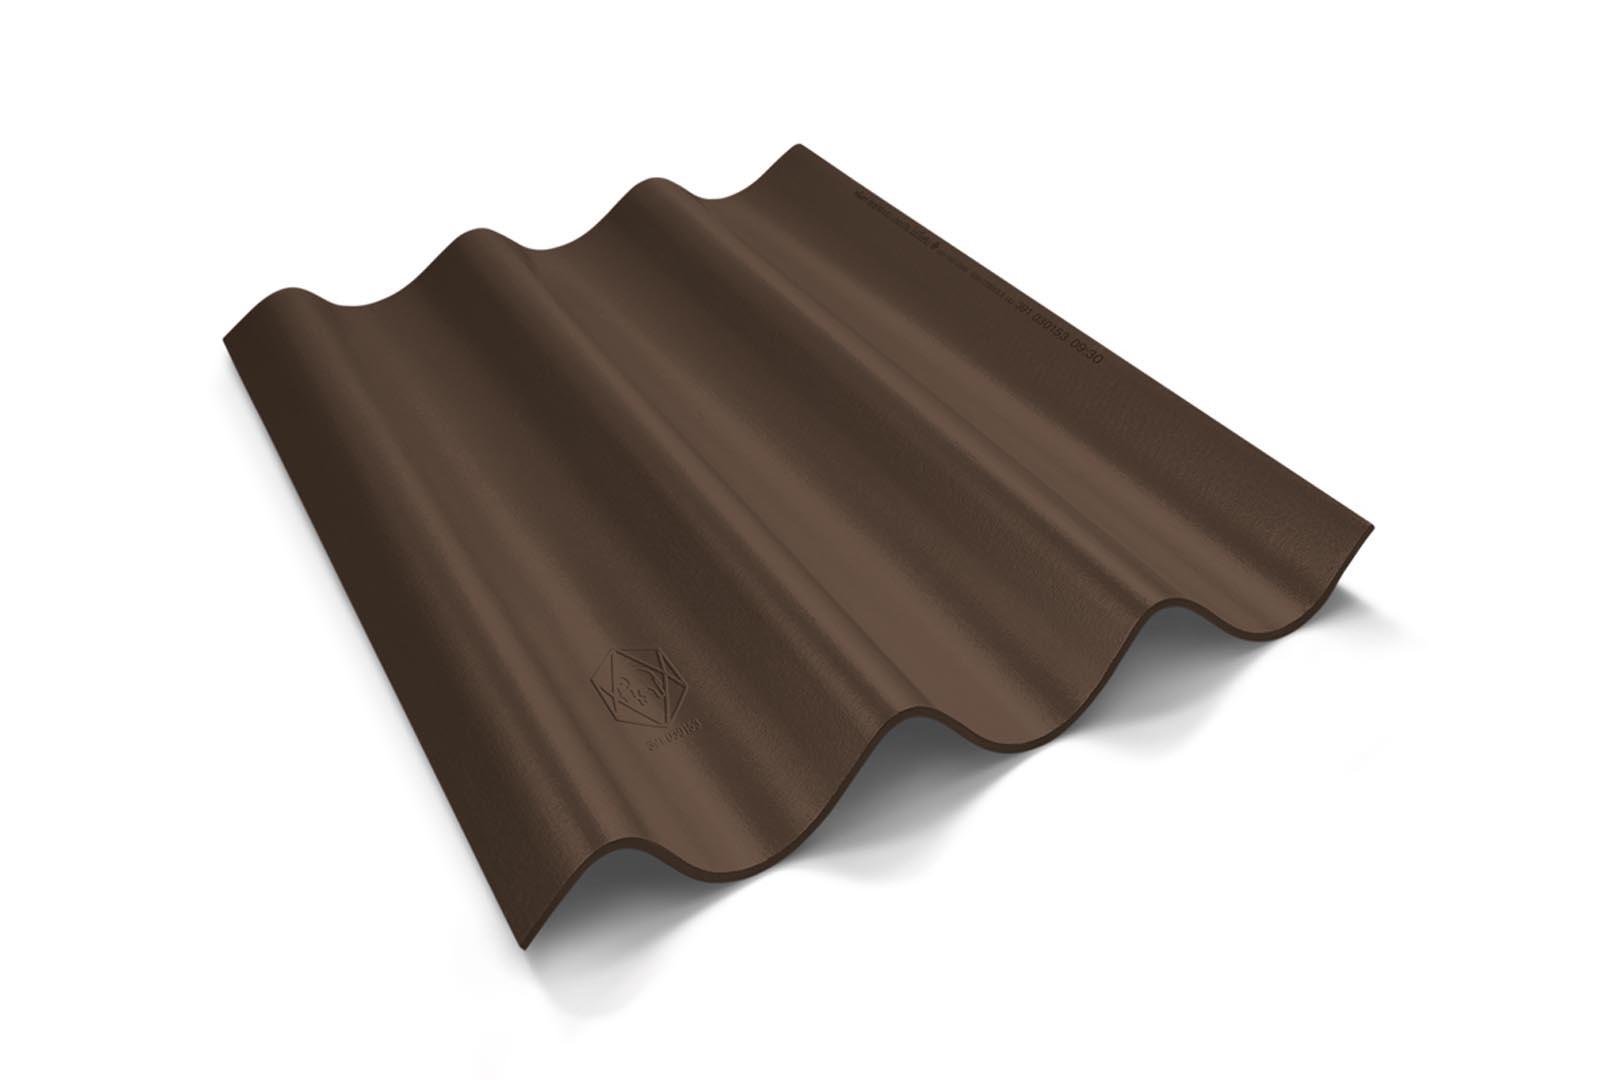 SCG-Fiber-Cement-Roof-prima-brown